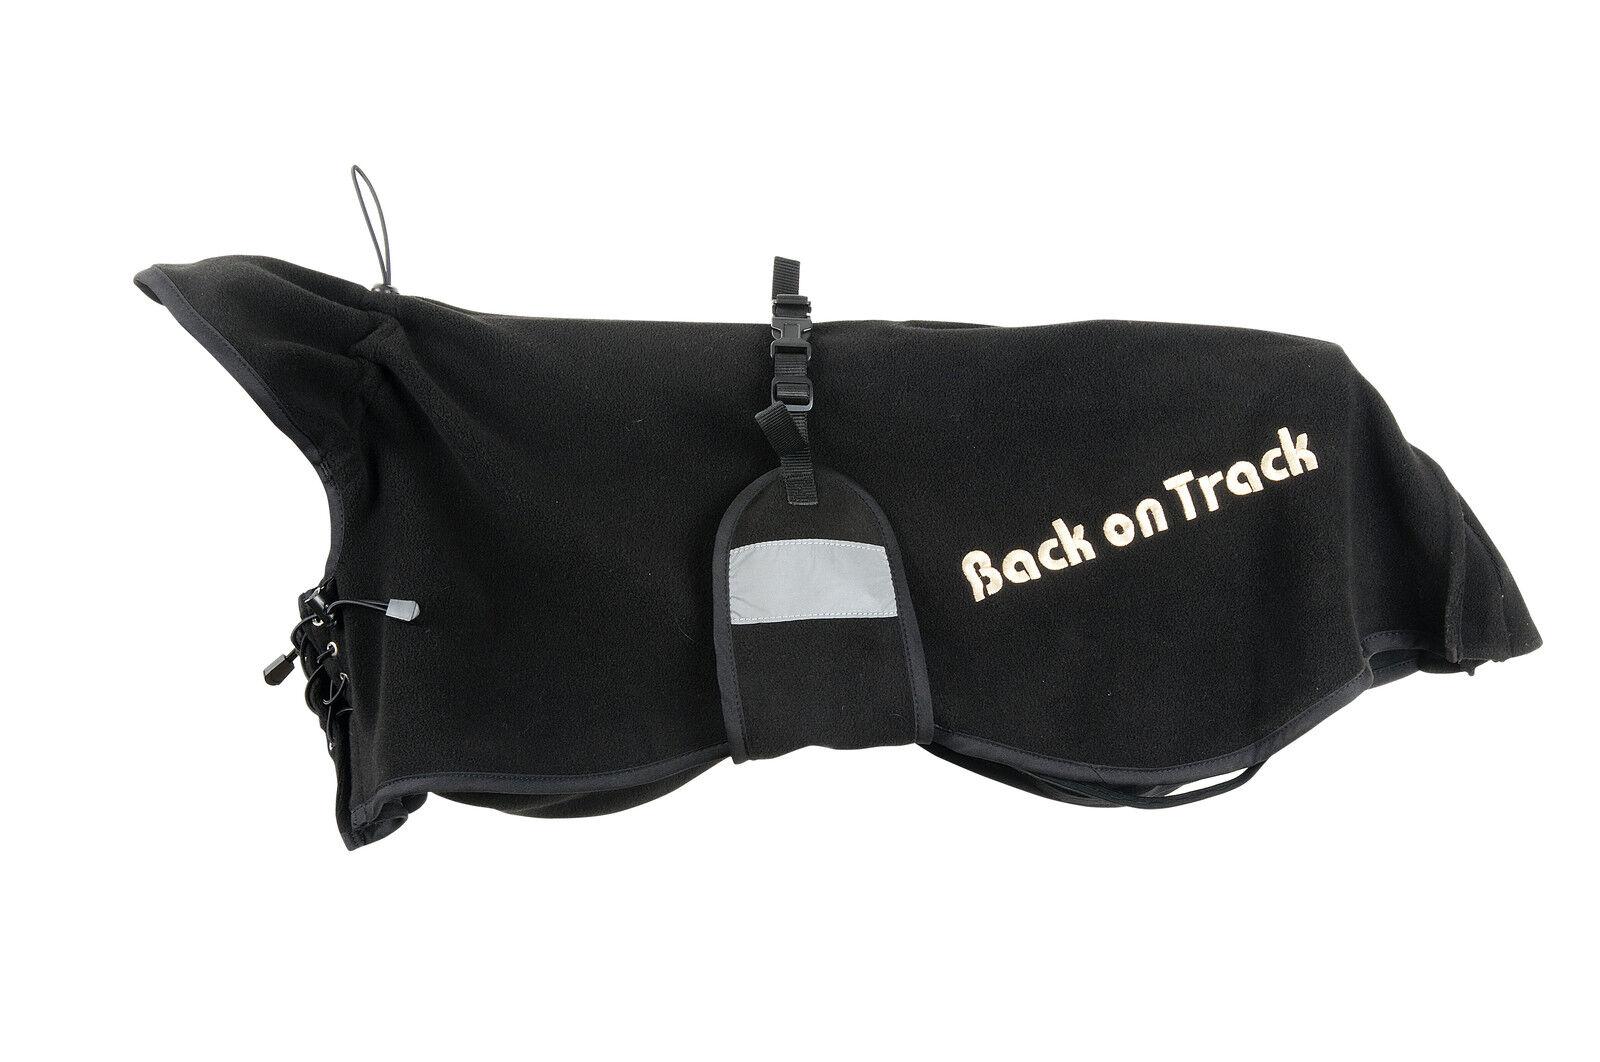 Back on Track Hundefleecemantel Hundemantel Fleece JETZT NEU - Größe 37-52 cm